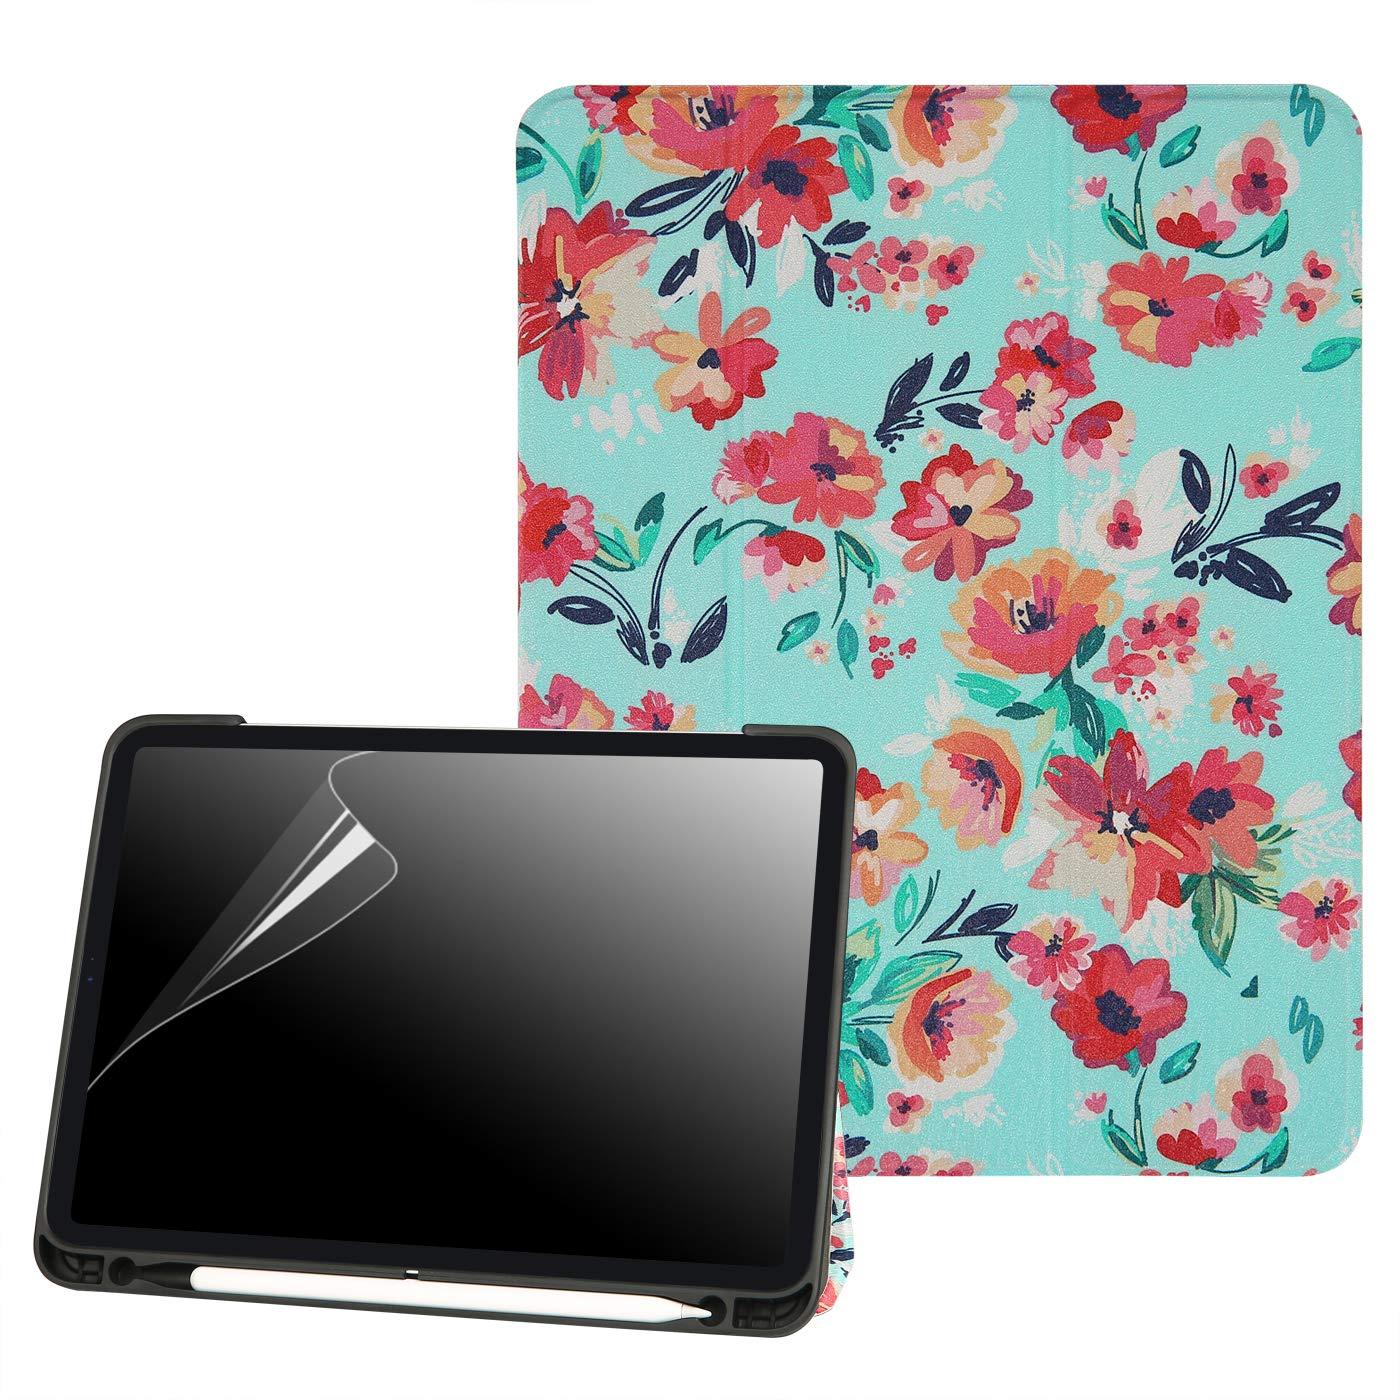 HDE iPad Pro 11インチ 2018用ケース 鉛筆ホルダー付き 三つ折りスタンド 自動スリープ解除スマートカバー:第2世代Apple Pencil充電をサポート One Size ターコイズ HDE-54360  B. Turquoise Floral B07LFN6DV4